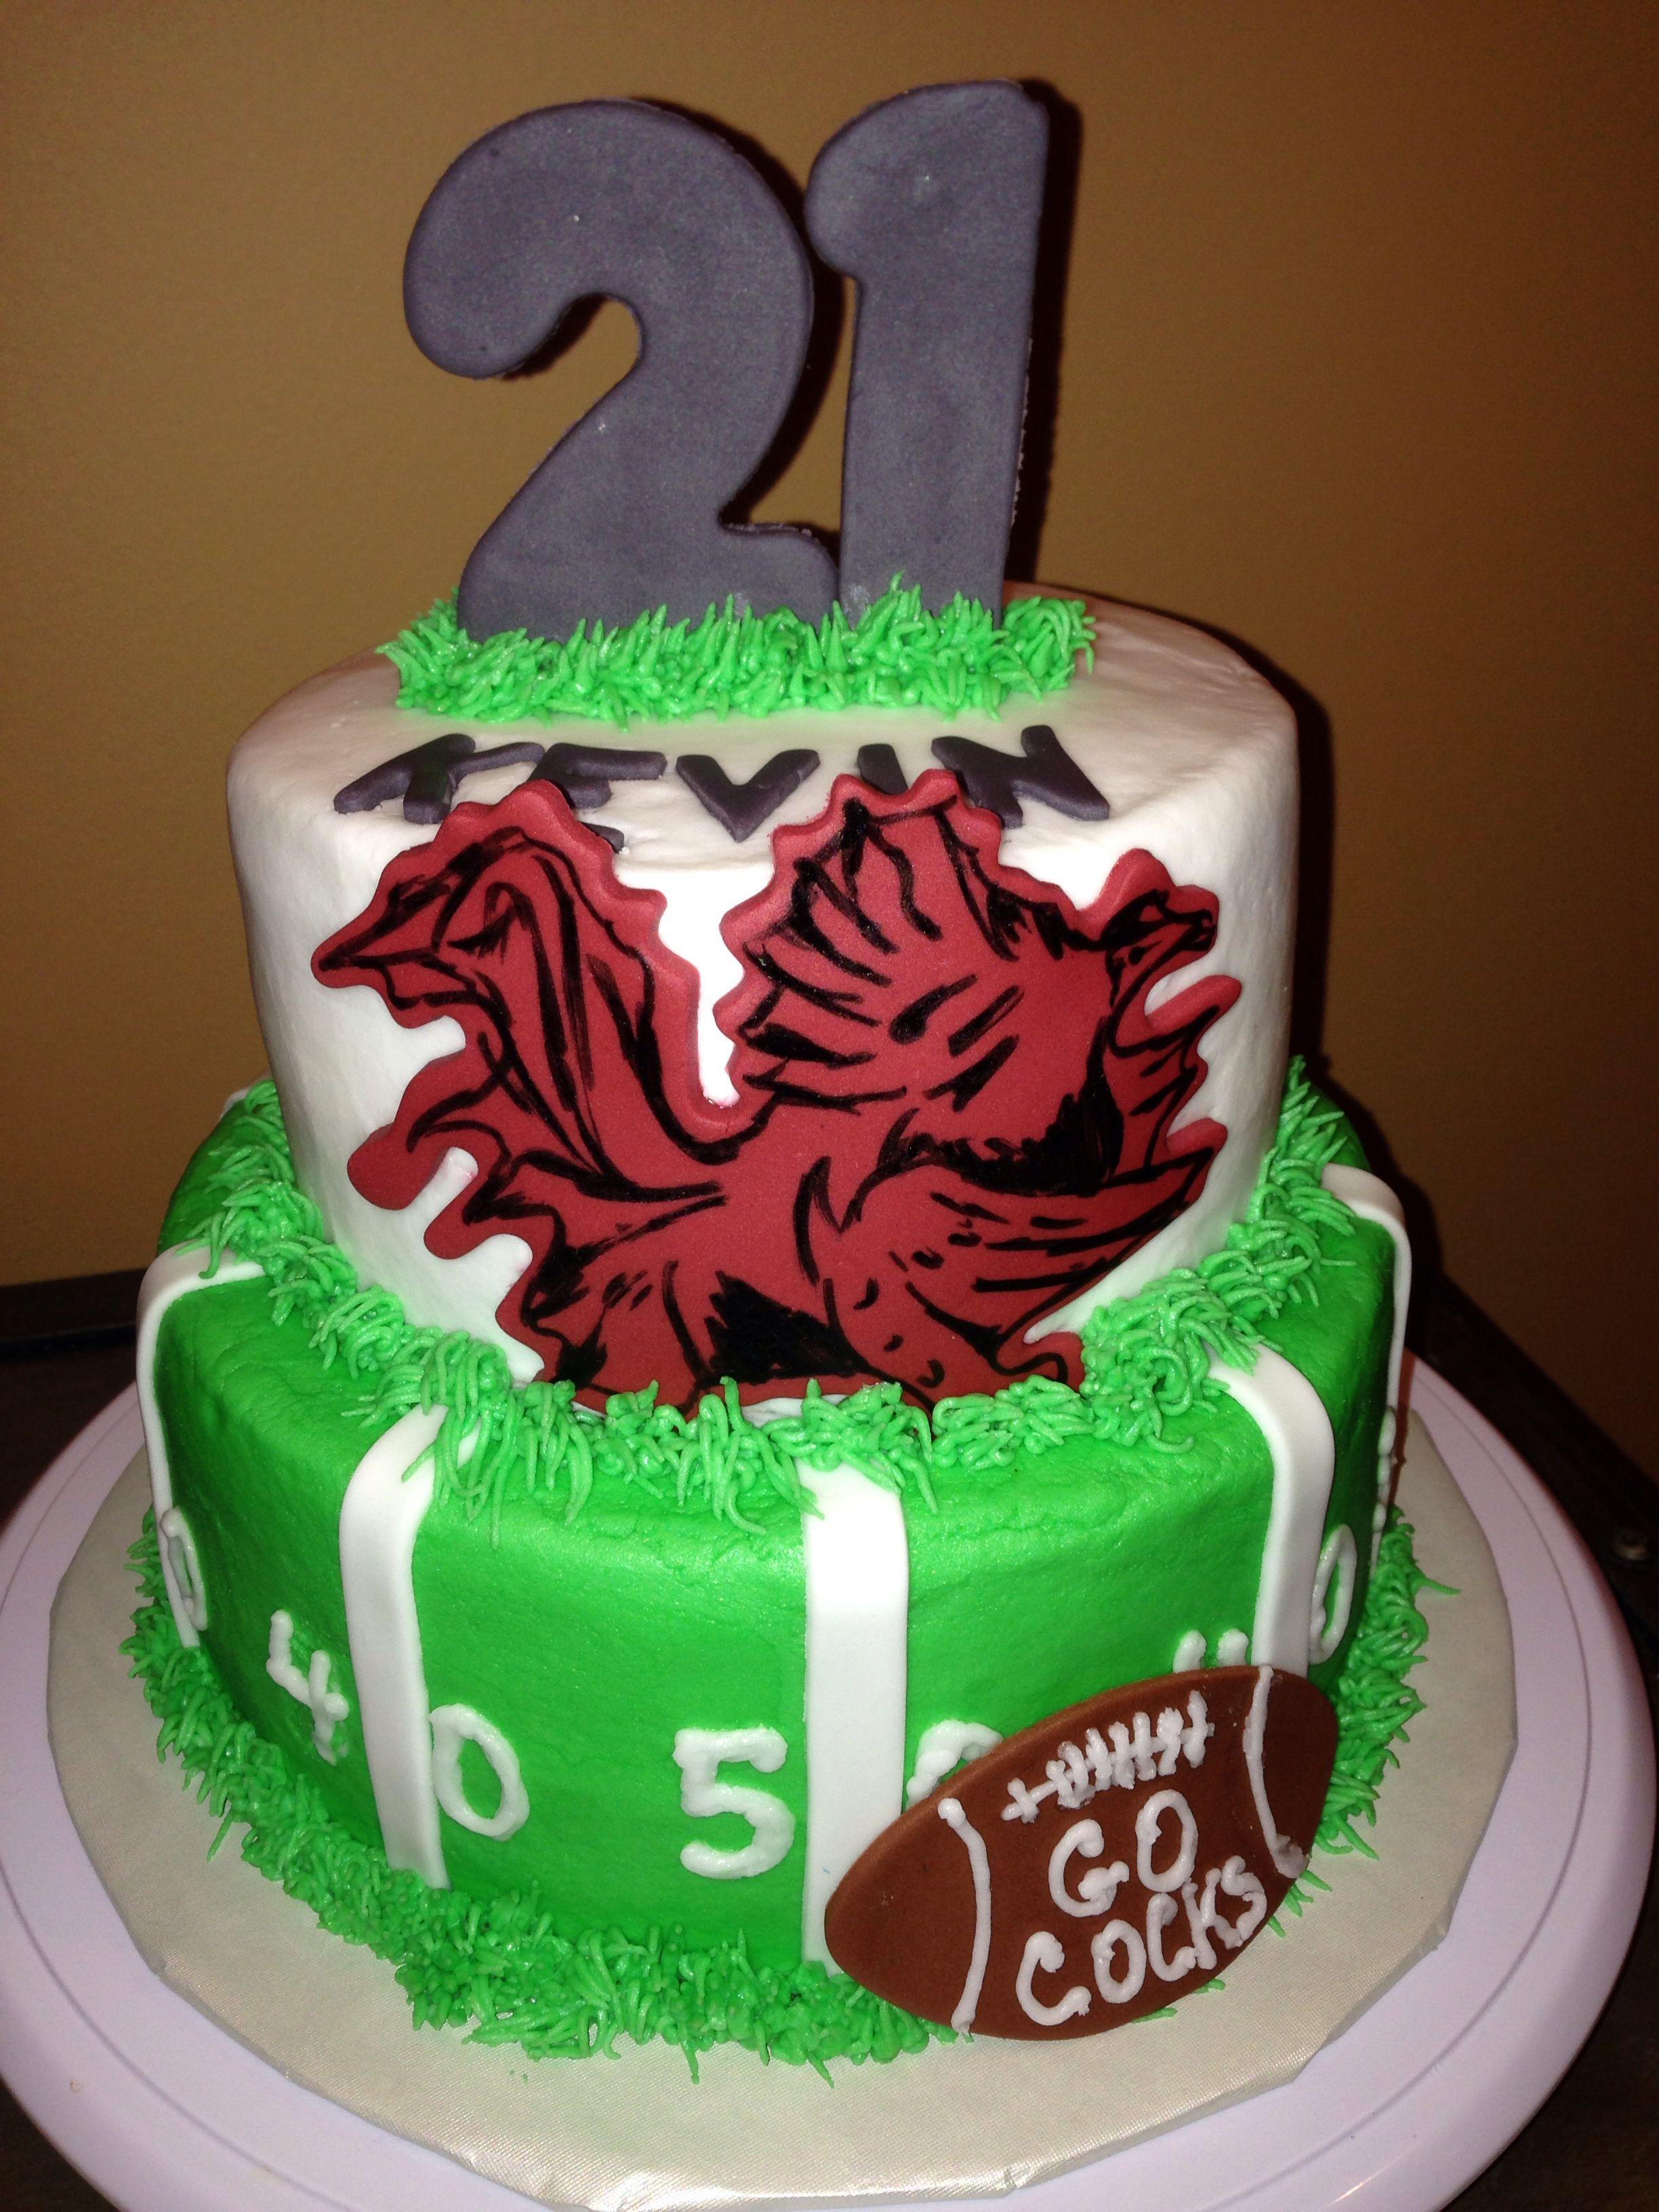 Two Tier Gamecock Cake Birthdays Pinterest Cake Birthday Cake